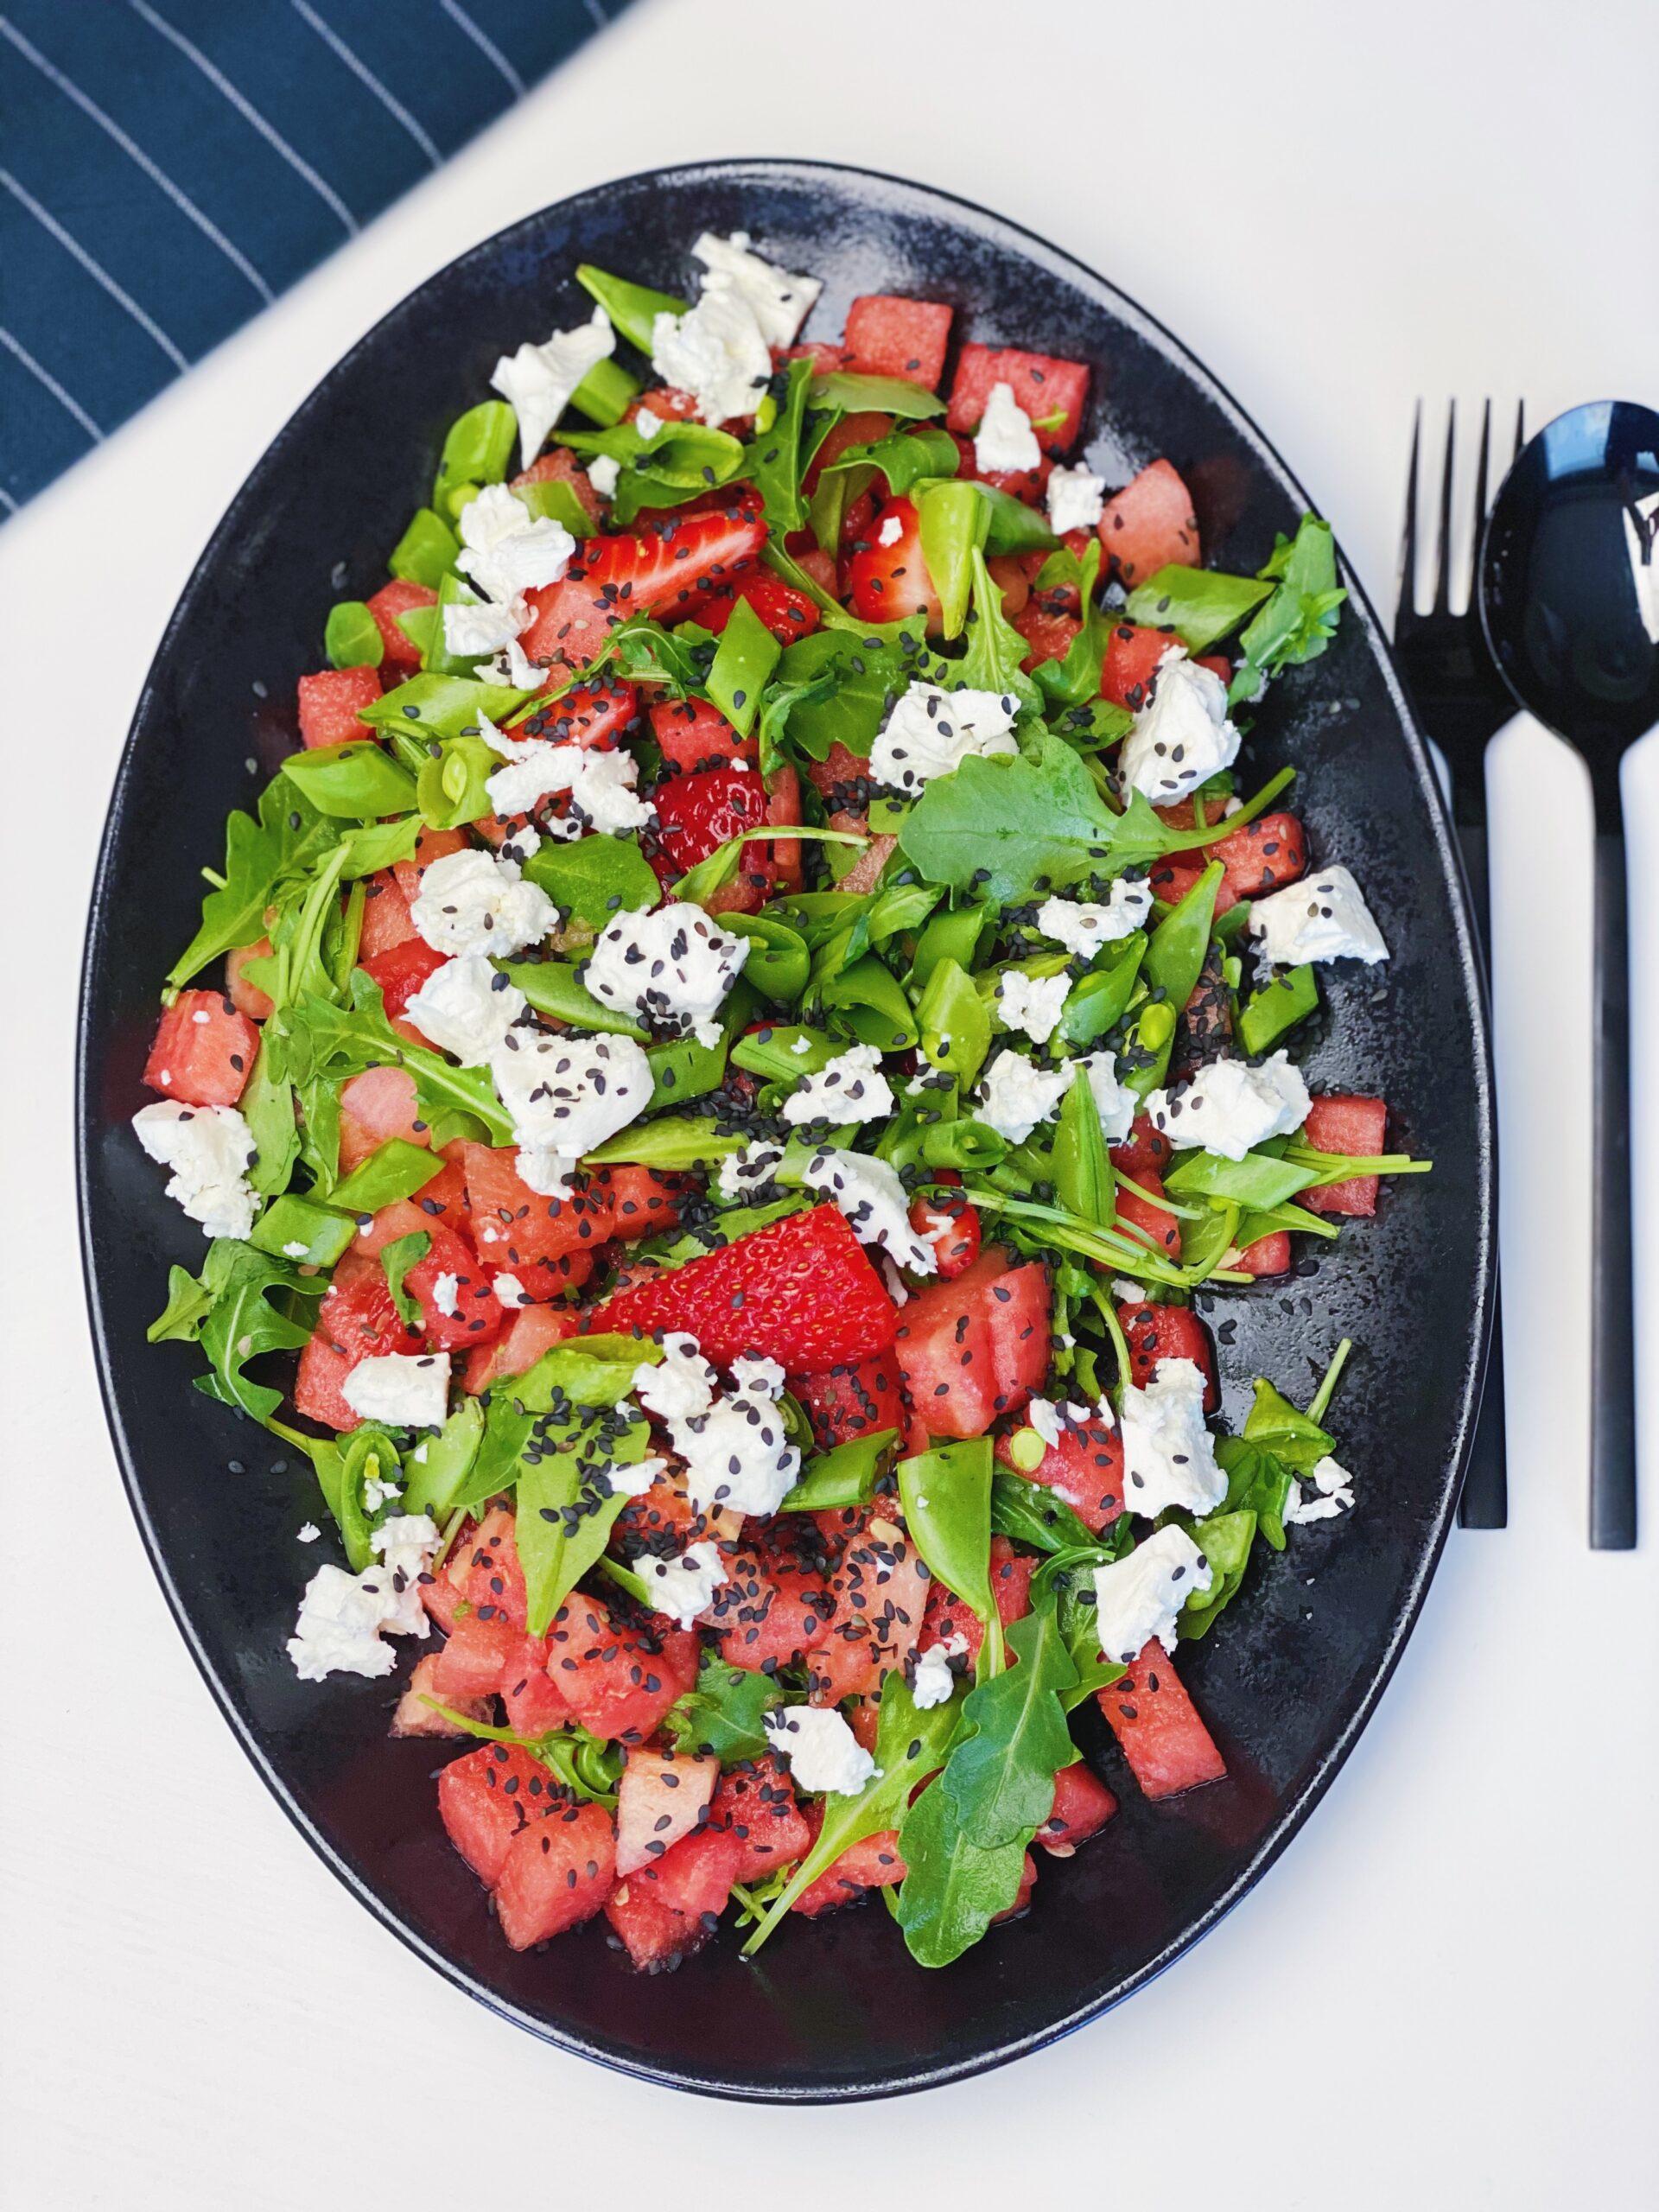 Sommersalat med vandmelon og jordbær på et sort fad